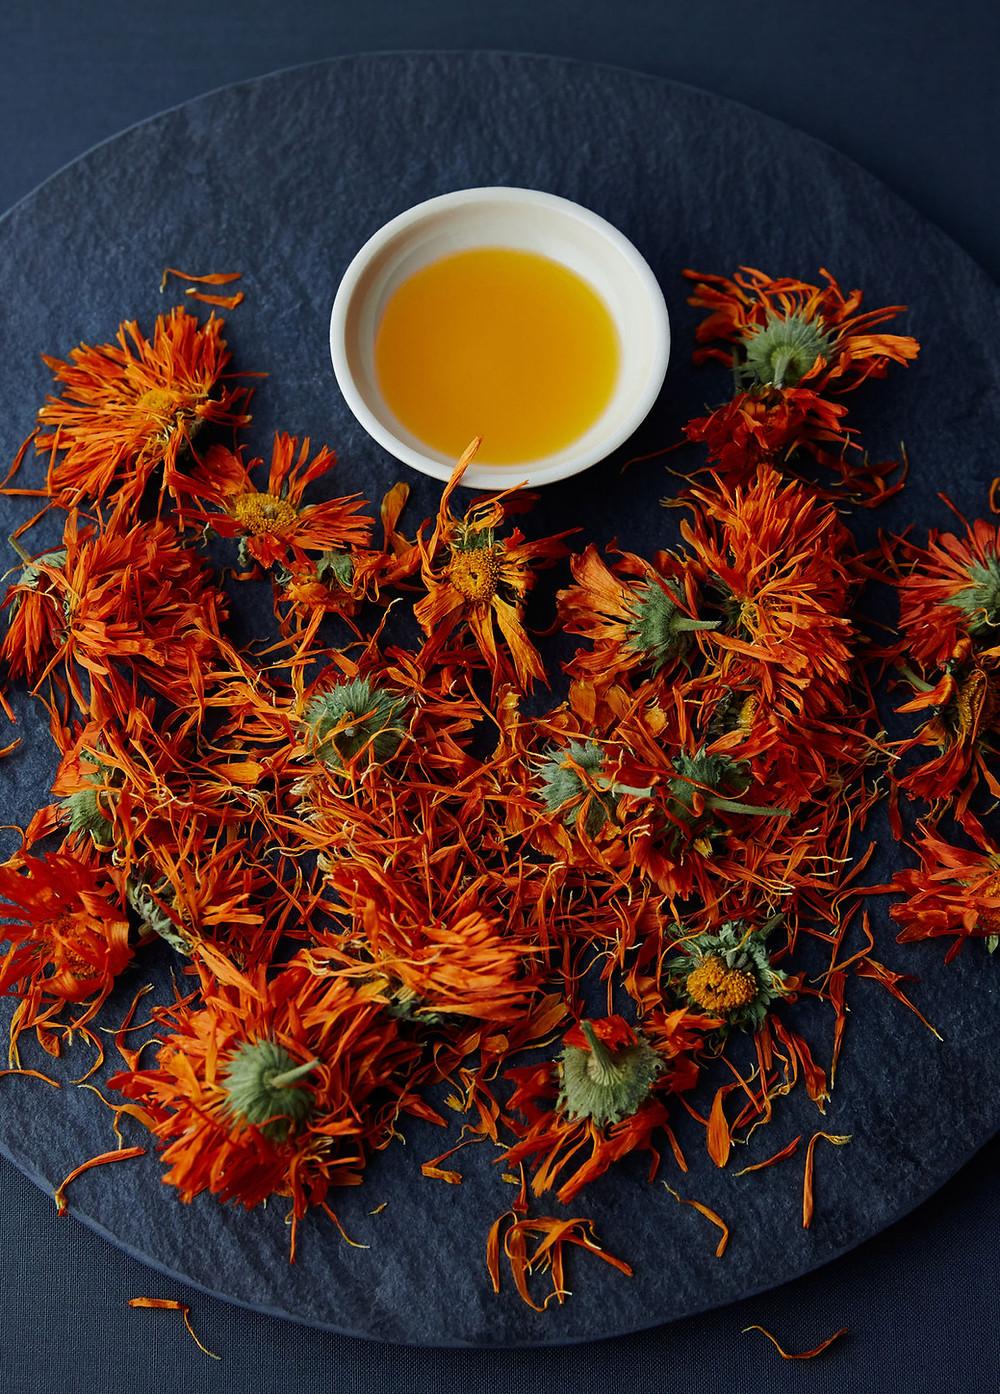 calendula-dried-golden-yellow-and-orange